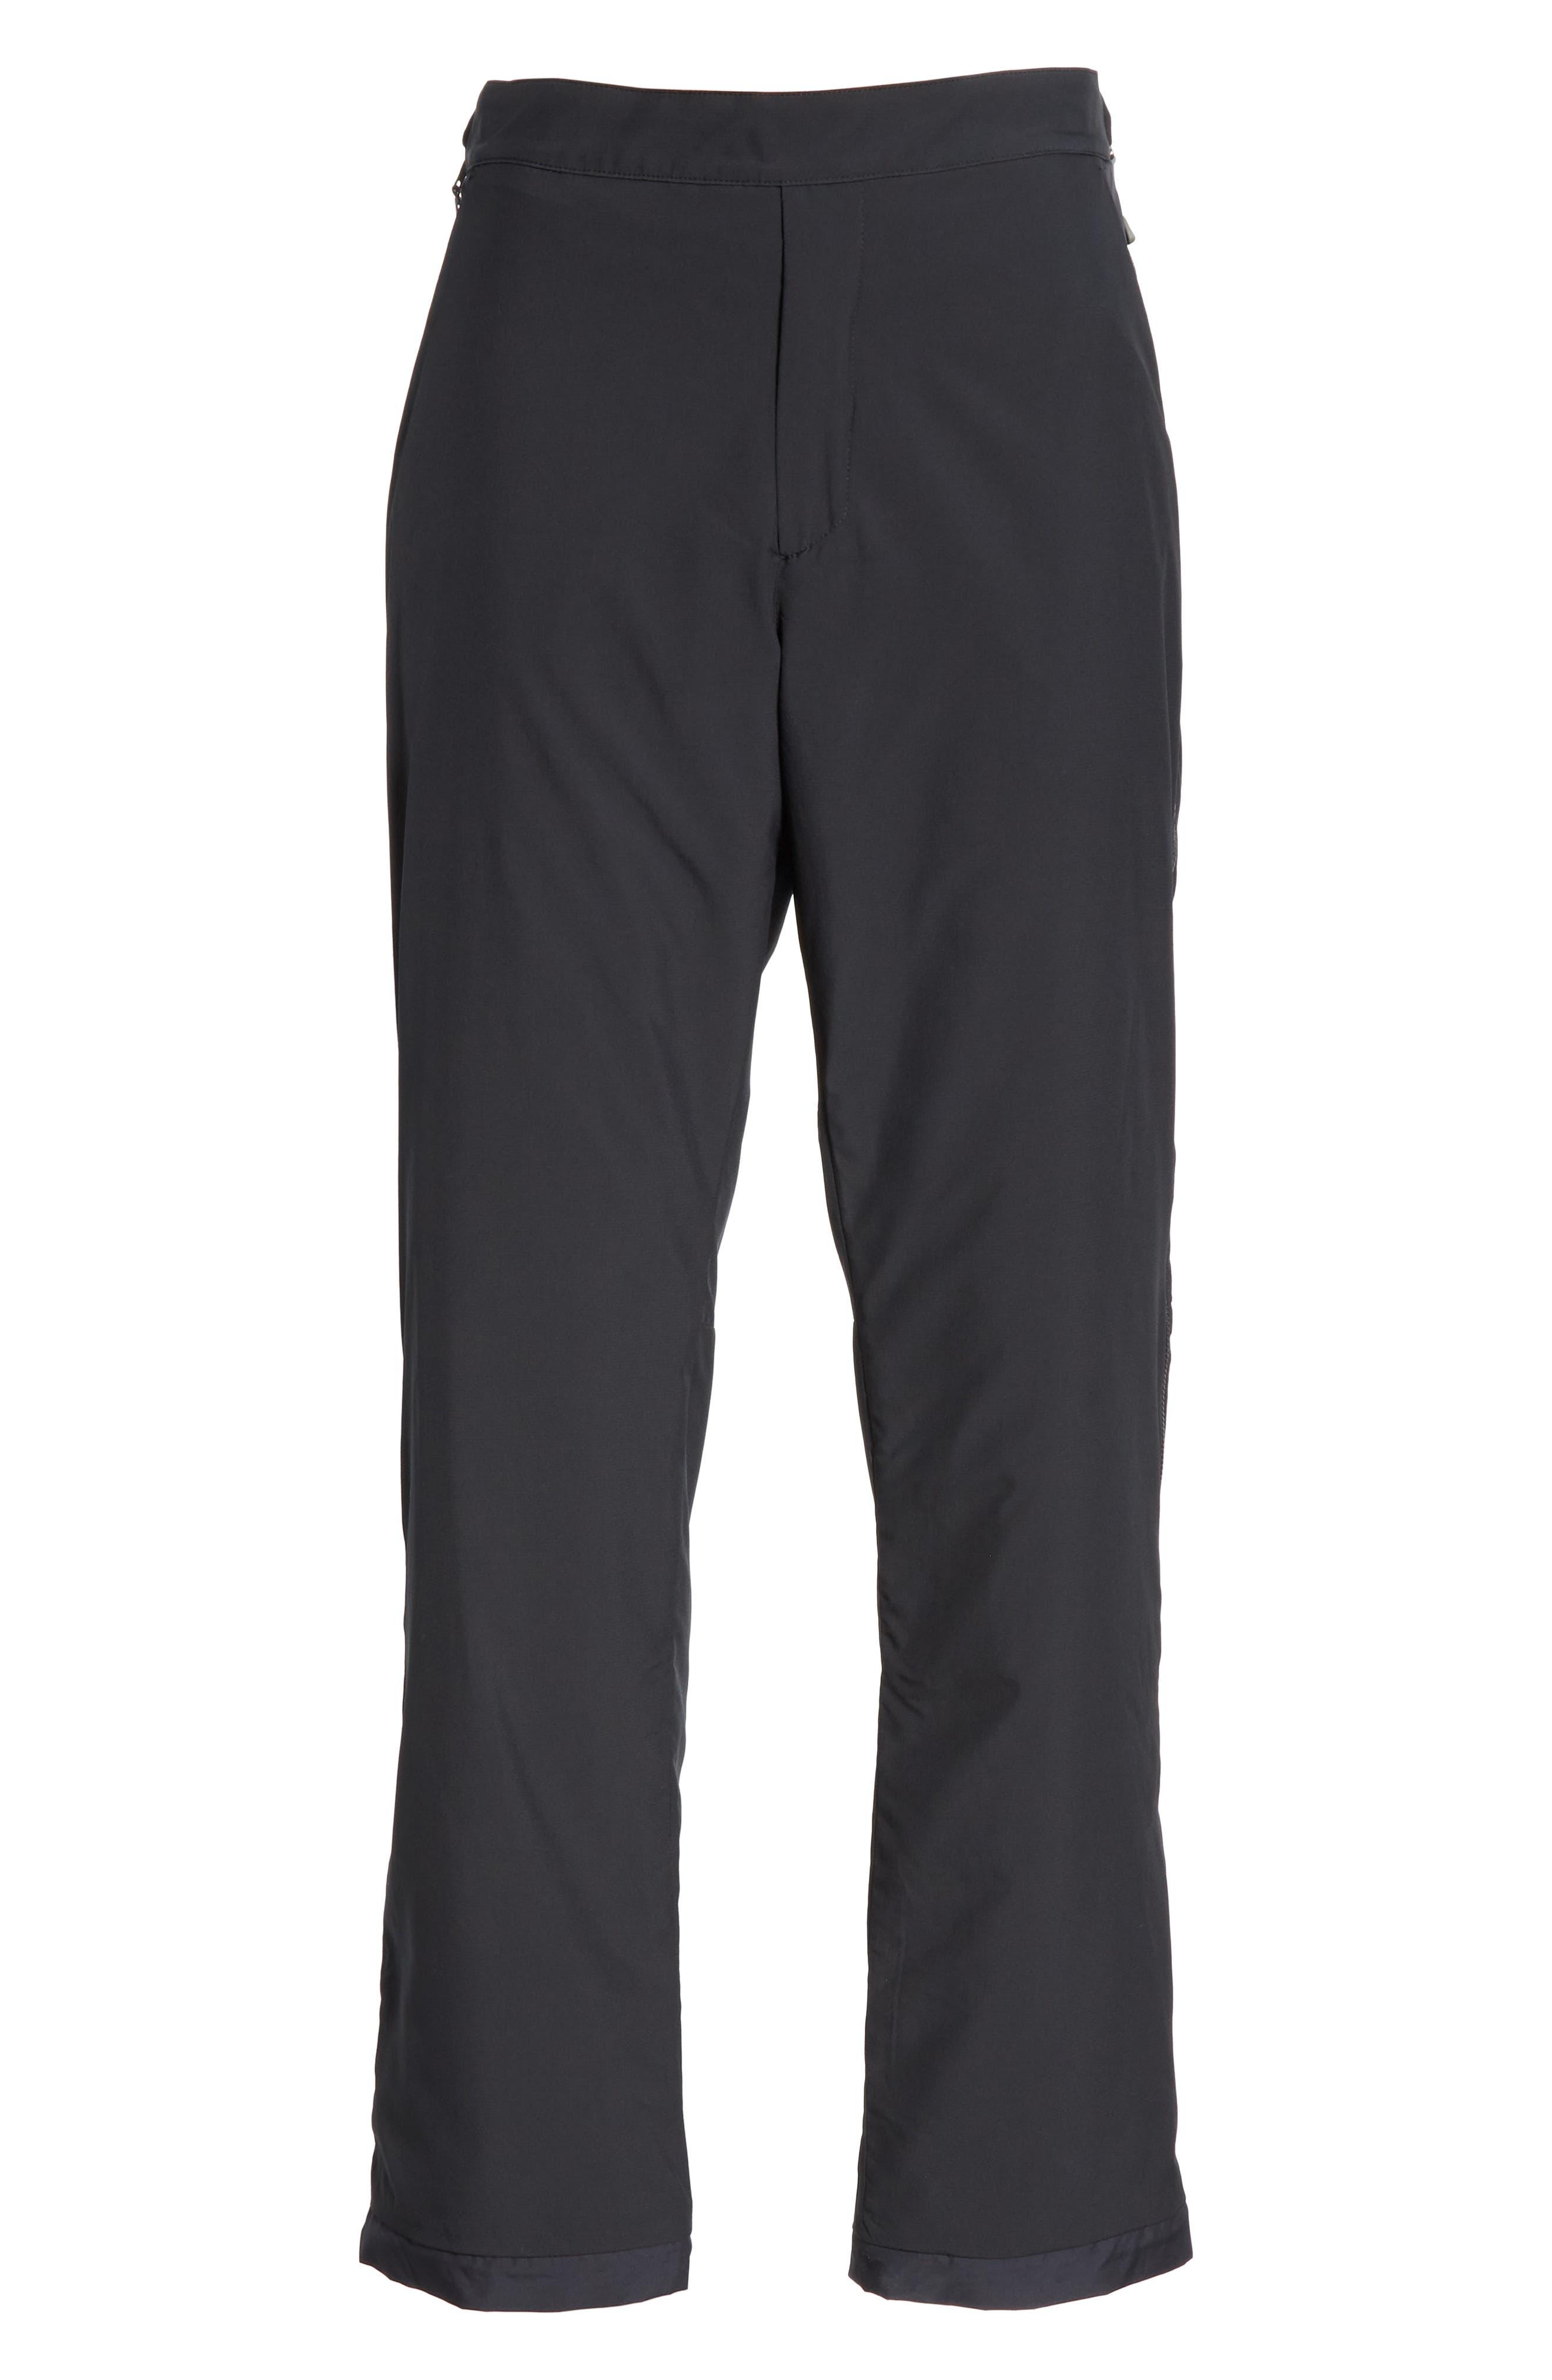 HOUDINI Ci Insulated Men's Pants, Main, color, 001